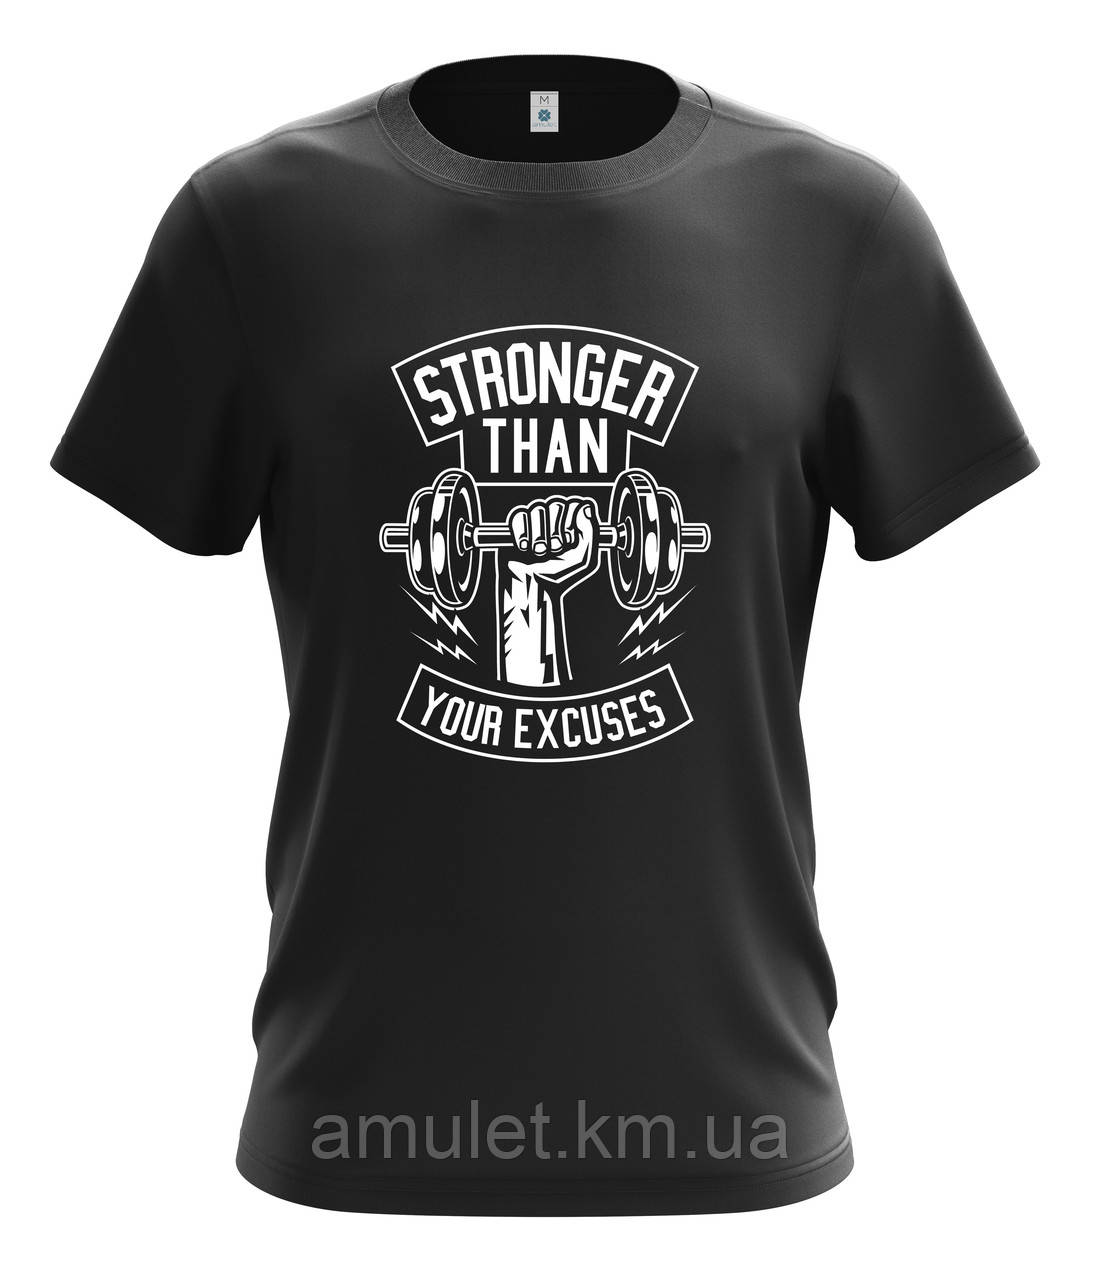 "Футболка мужская спортивная ""Stronger in GYM"" Черный, M"